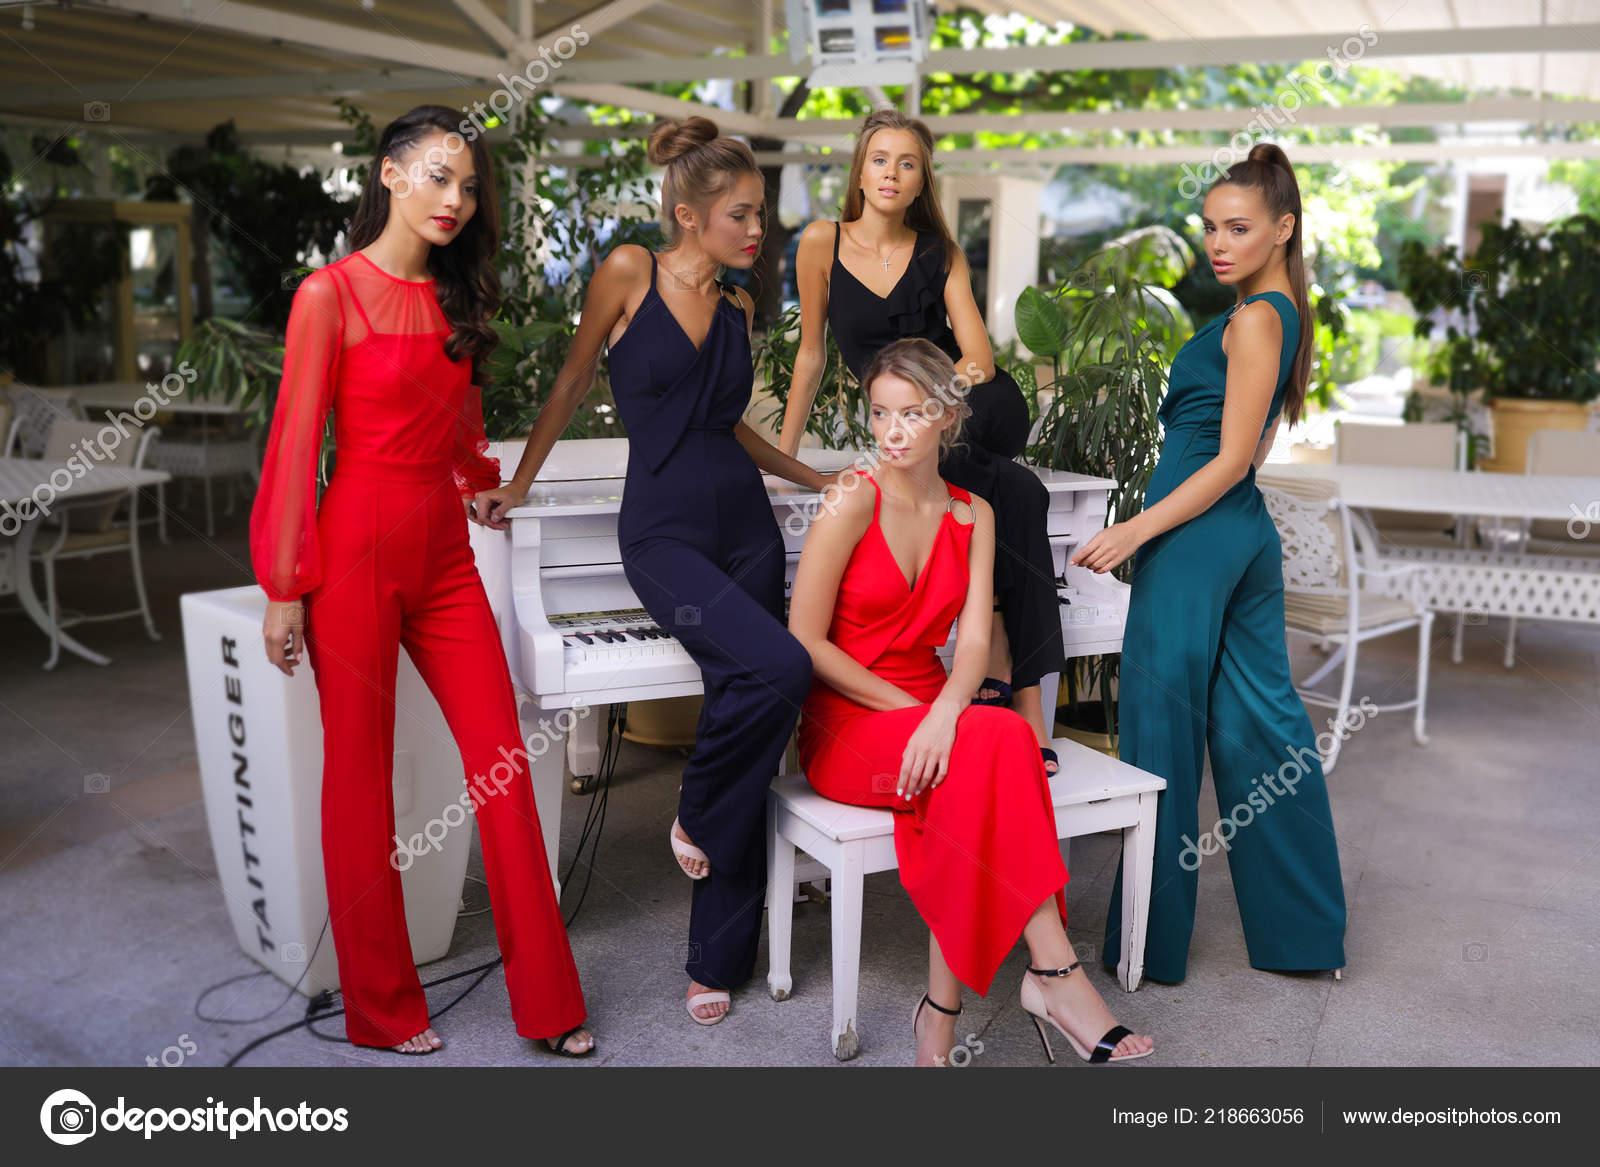 8e1049787100 Καταπληκτικό Πέντε Κορίτσια Στα Διαφορετικά Πολύχρωμα Κοστούμια Στέκεται Κοντά  Πιάνο– εικόνα αρχείου